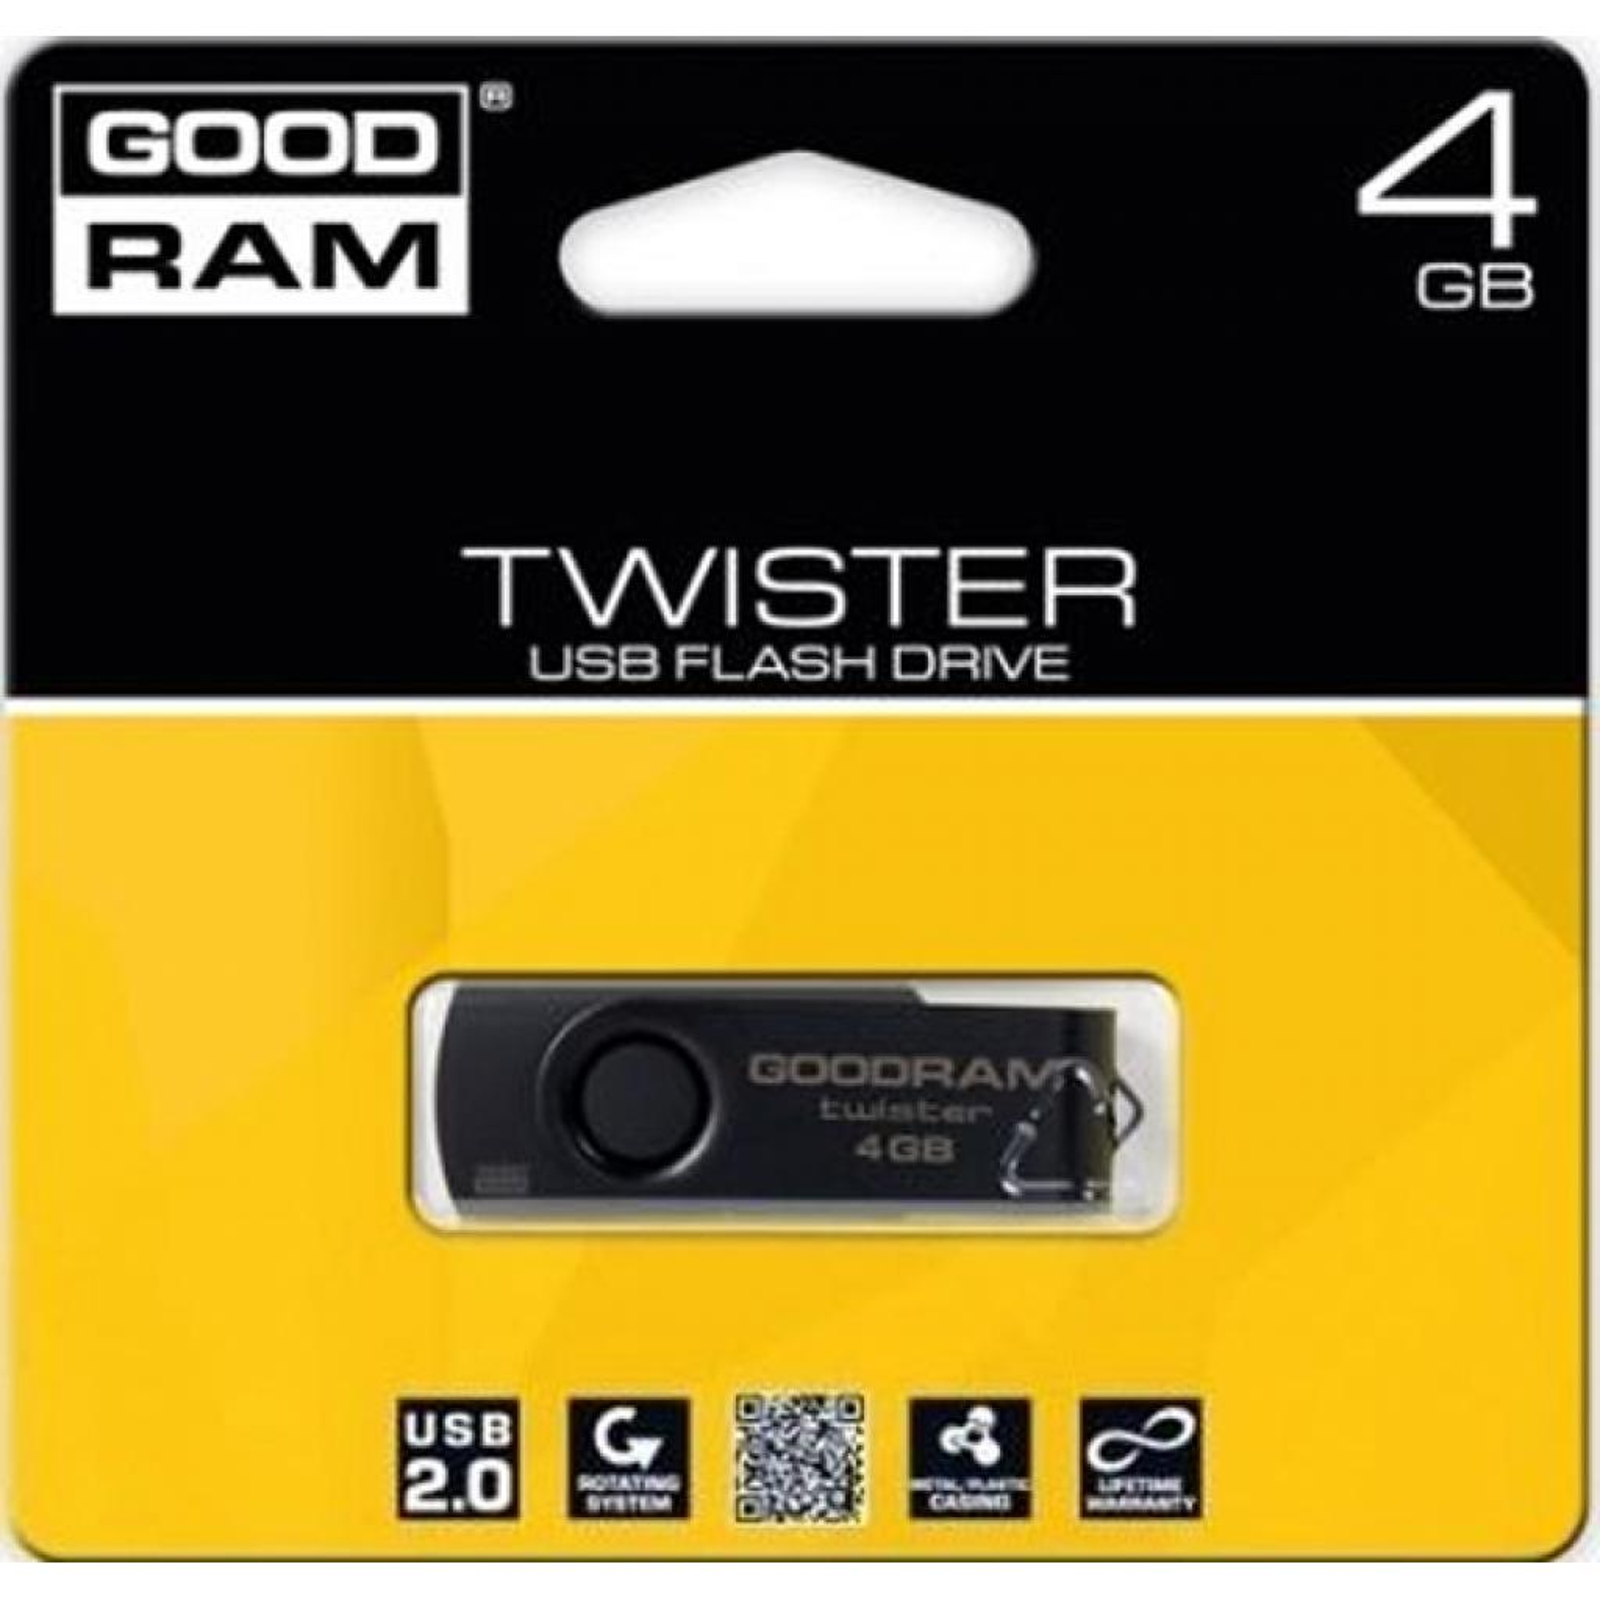 USB флеш накопитель GOODRAM 4GB TWISTER Black clip USB 2.0 (UTS2-0040KKR11) изображение 2